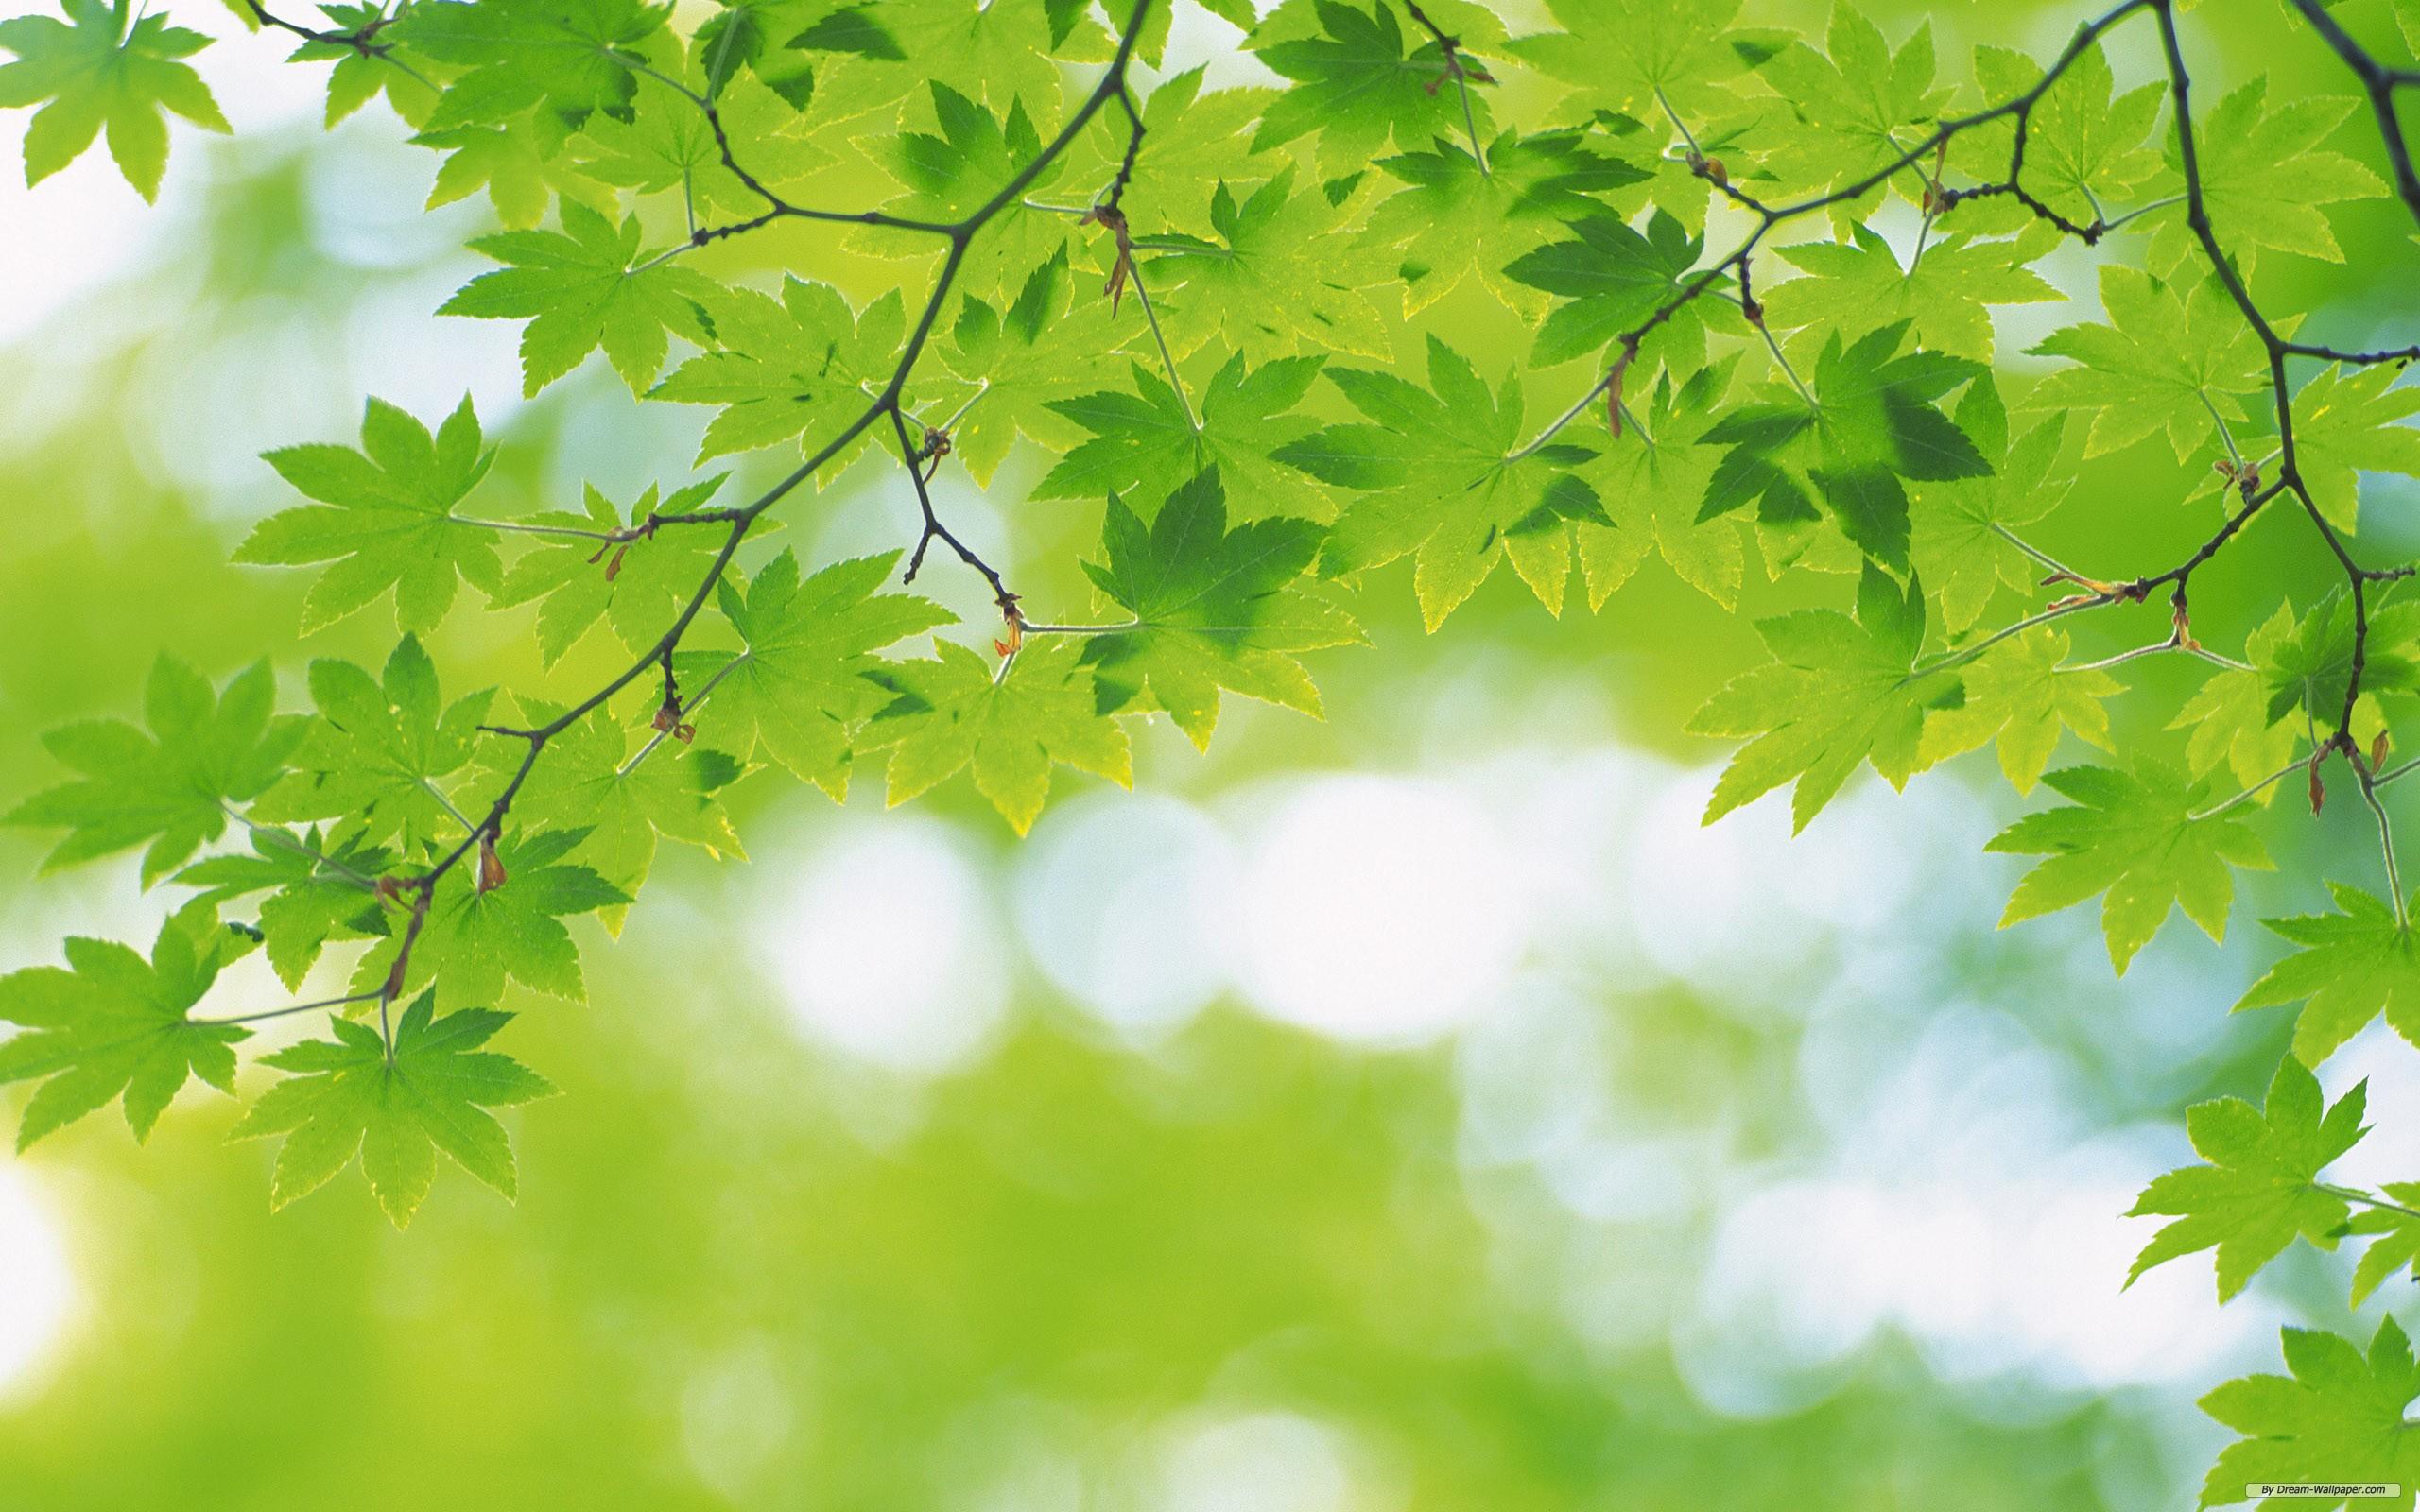 Nature wallpaper   Green leaves 2 wallpaper   2560x1600 wallpaper 2560x1600